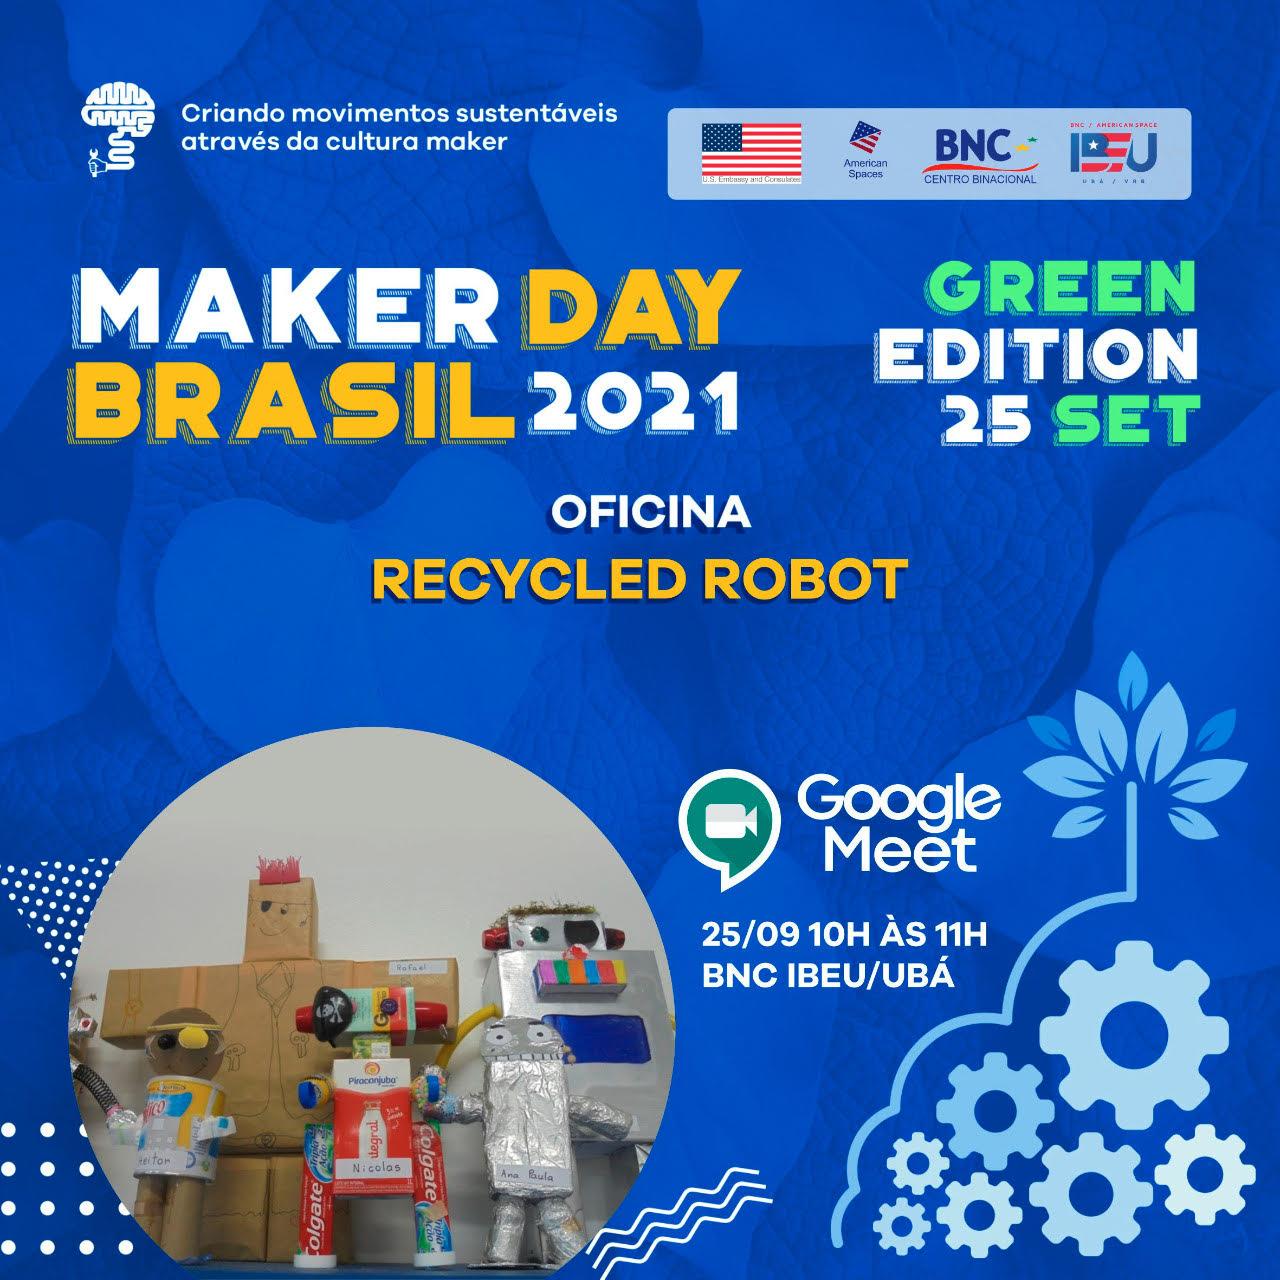 UBÁ - RECICLED ROBOT